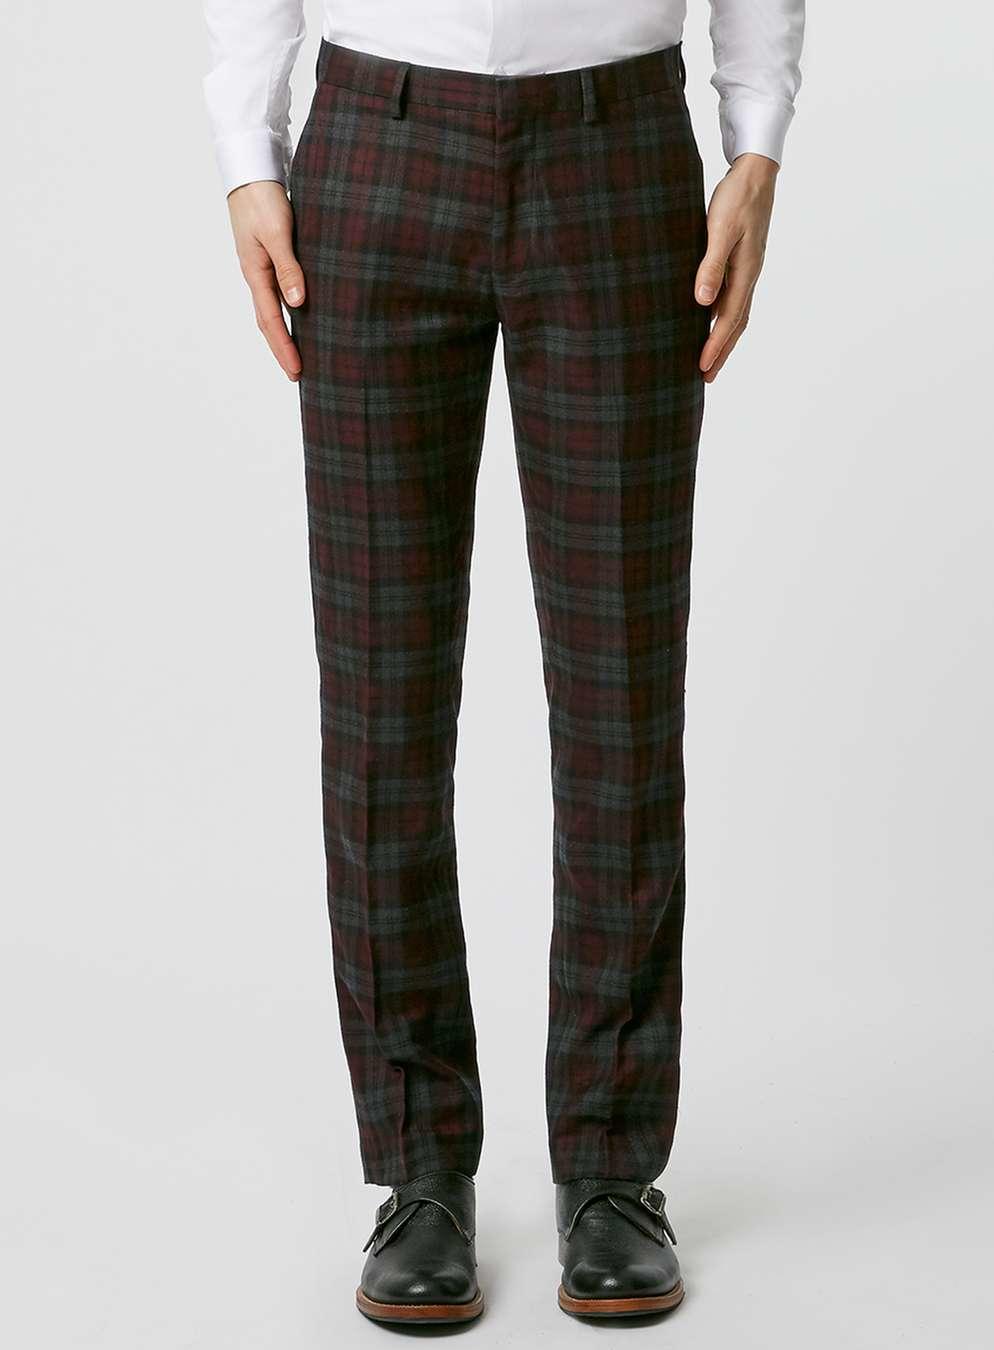 5c9d649526d6 Lyst - TOPMAN Burgundy Check Skinny Suit Pants in Red for Men